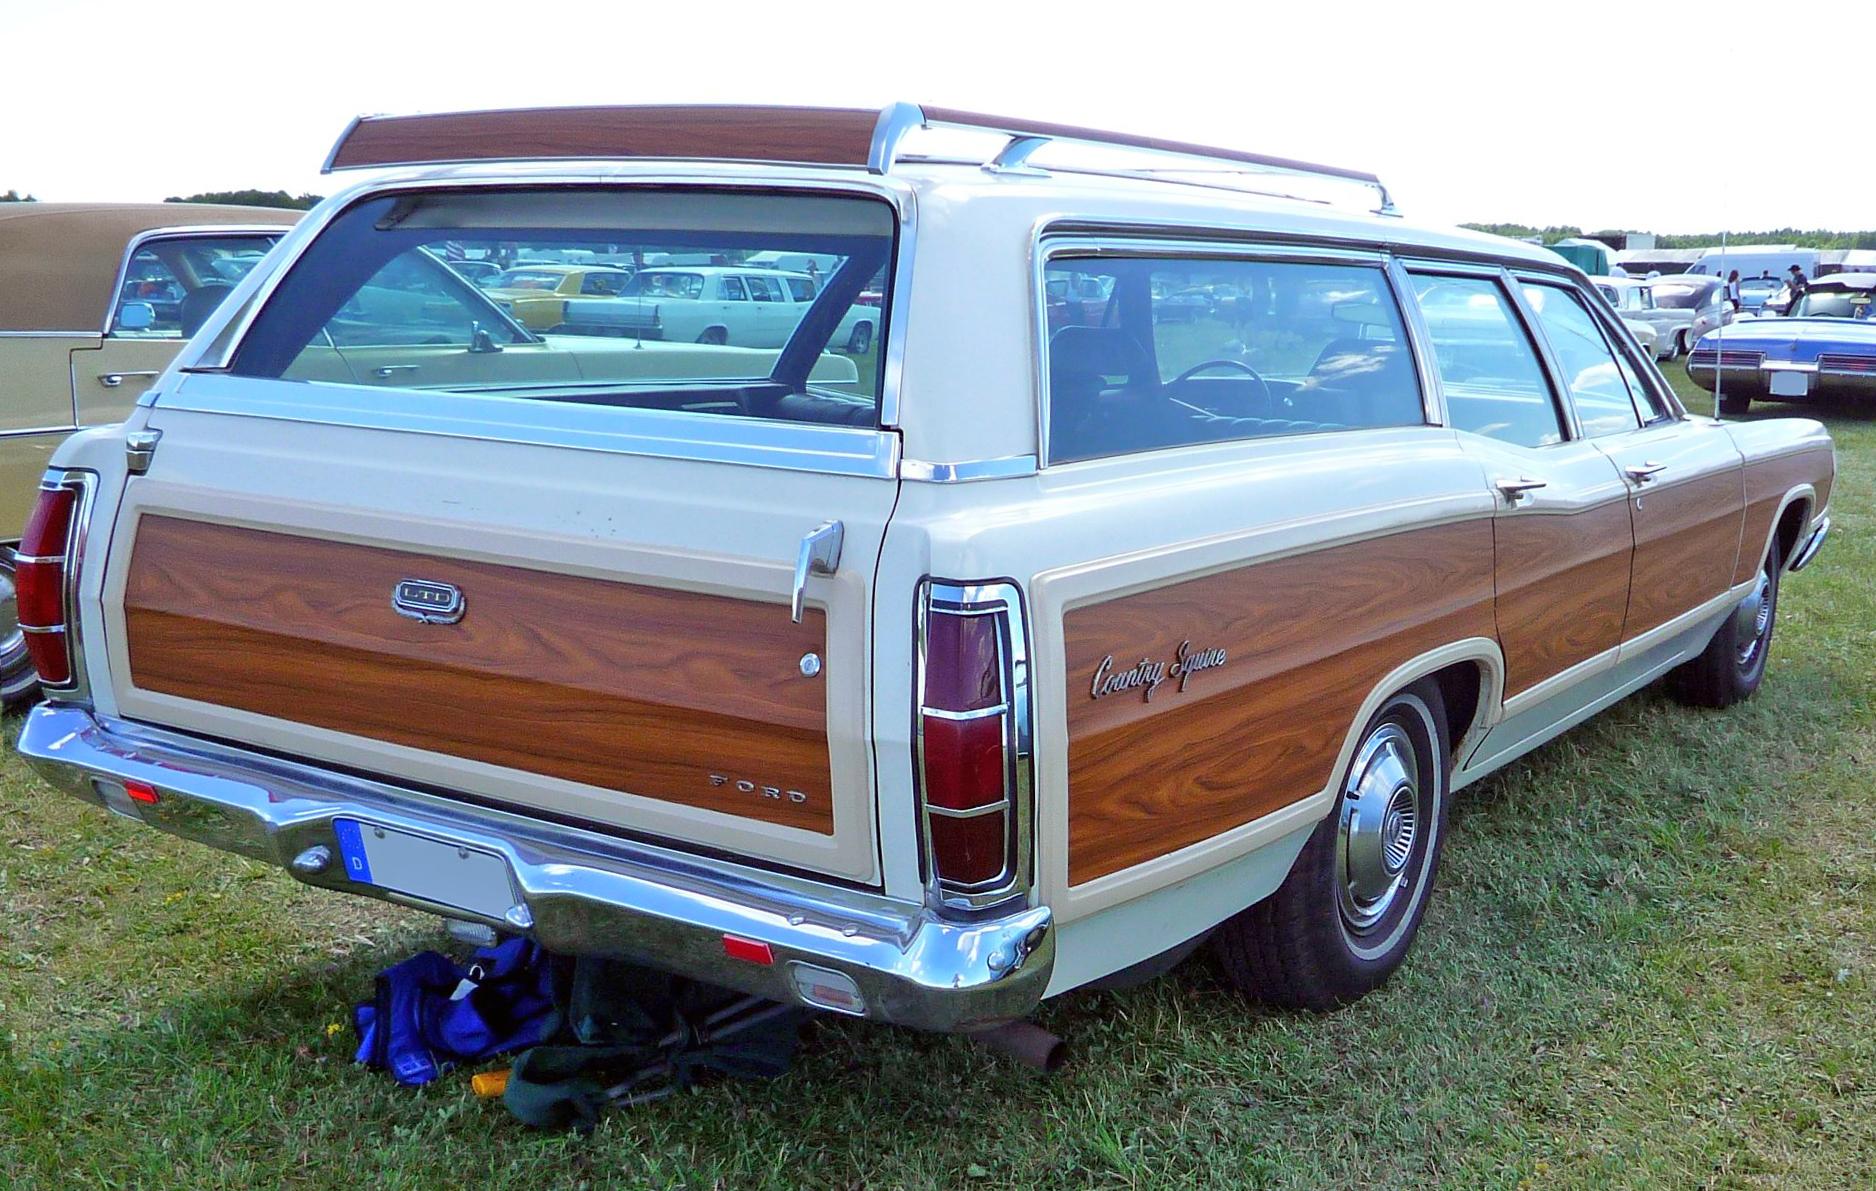 2018 Dodge Ramcharger likewise 43688 additionally 1978 Dodge Aspen Overview C14949 additionally 1978 MERCURY MONARCH 2 DOOR HARDTOP 125190 also 1969 Chrysler Newport Interior aPQ7fa4kdezNuw7KNqd89P 7Cjavi3HLKF0bt7MIayWJU. on 1977 dodge power wagon 4 door